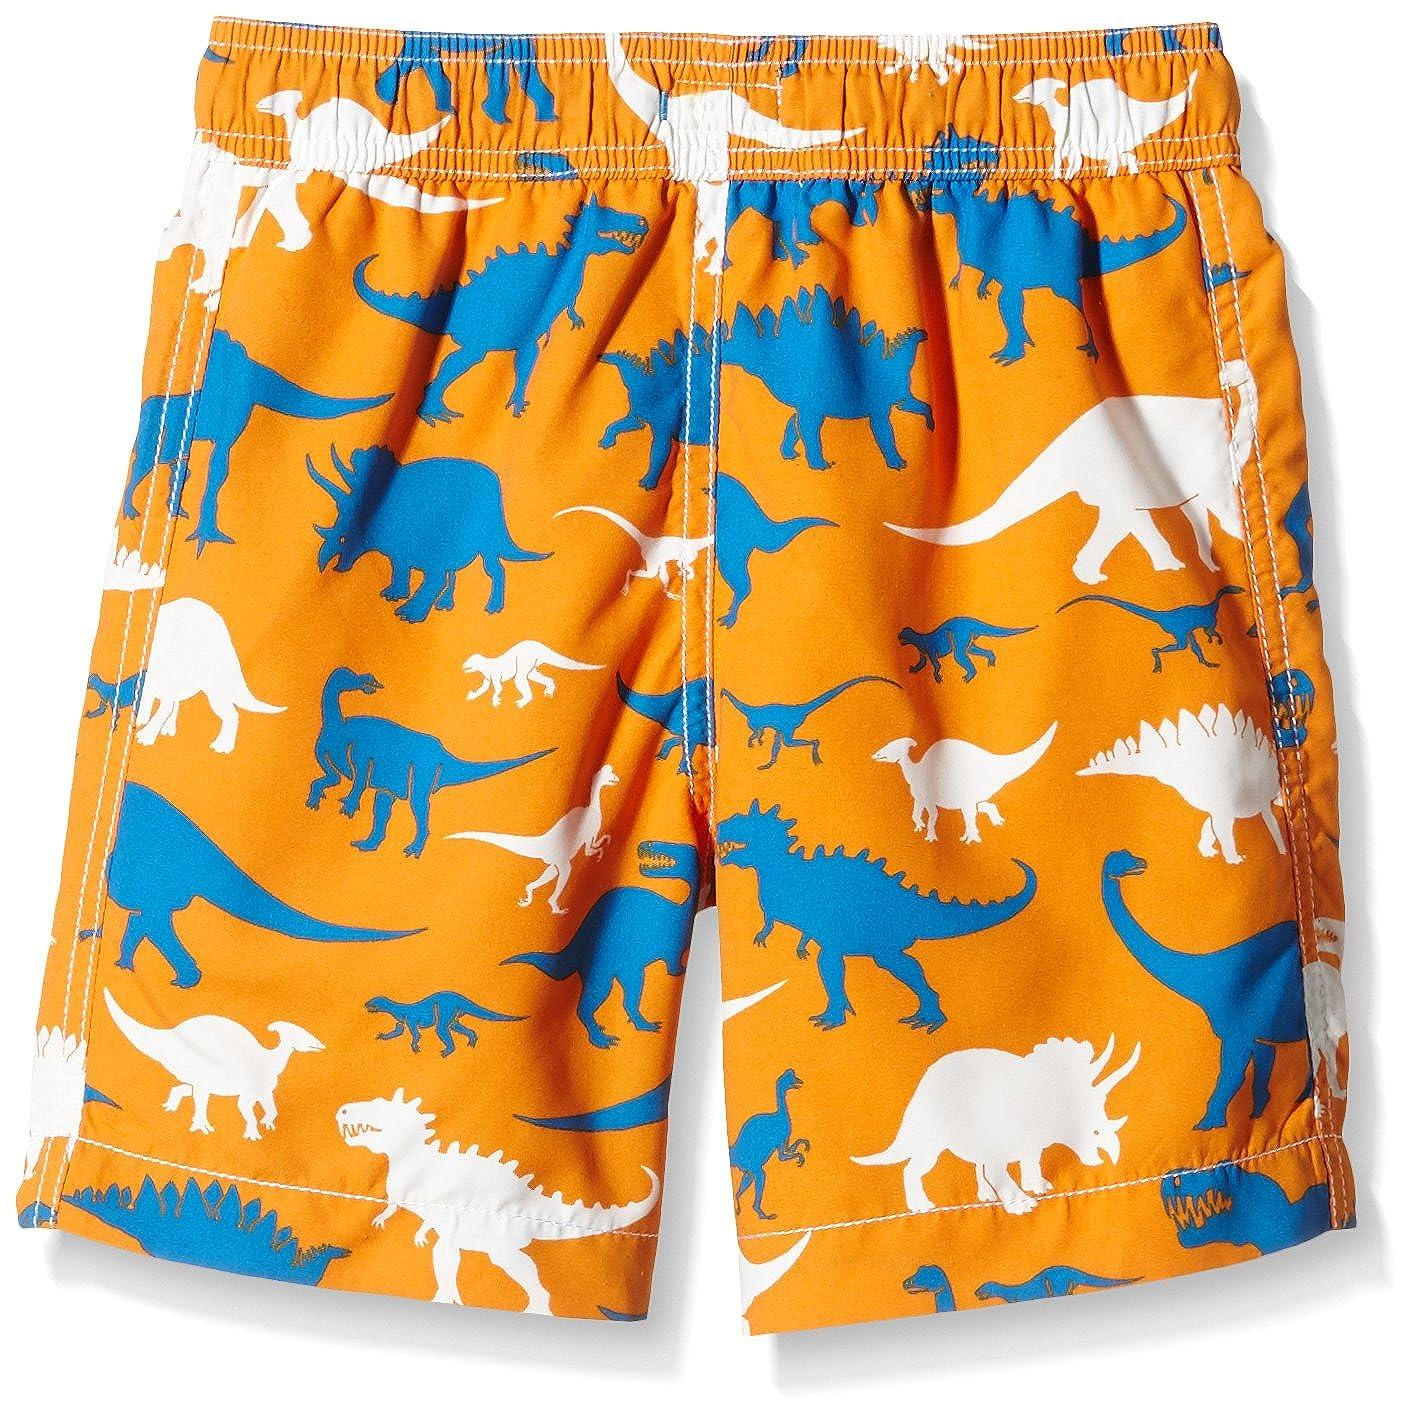 Hatley Boys Wild Dinos Swim Trunks